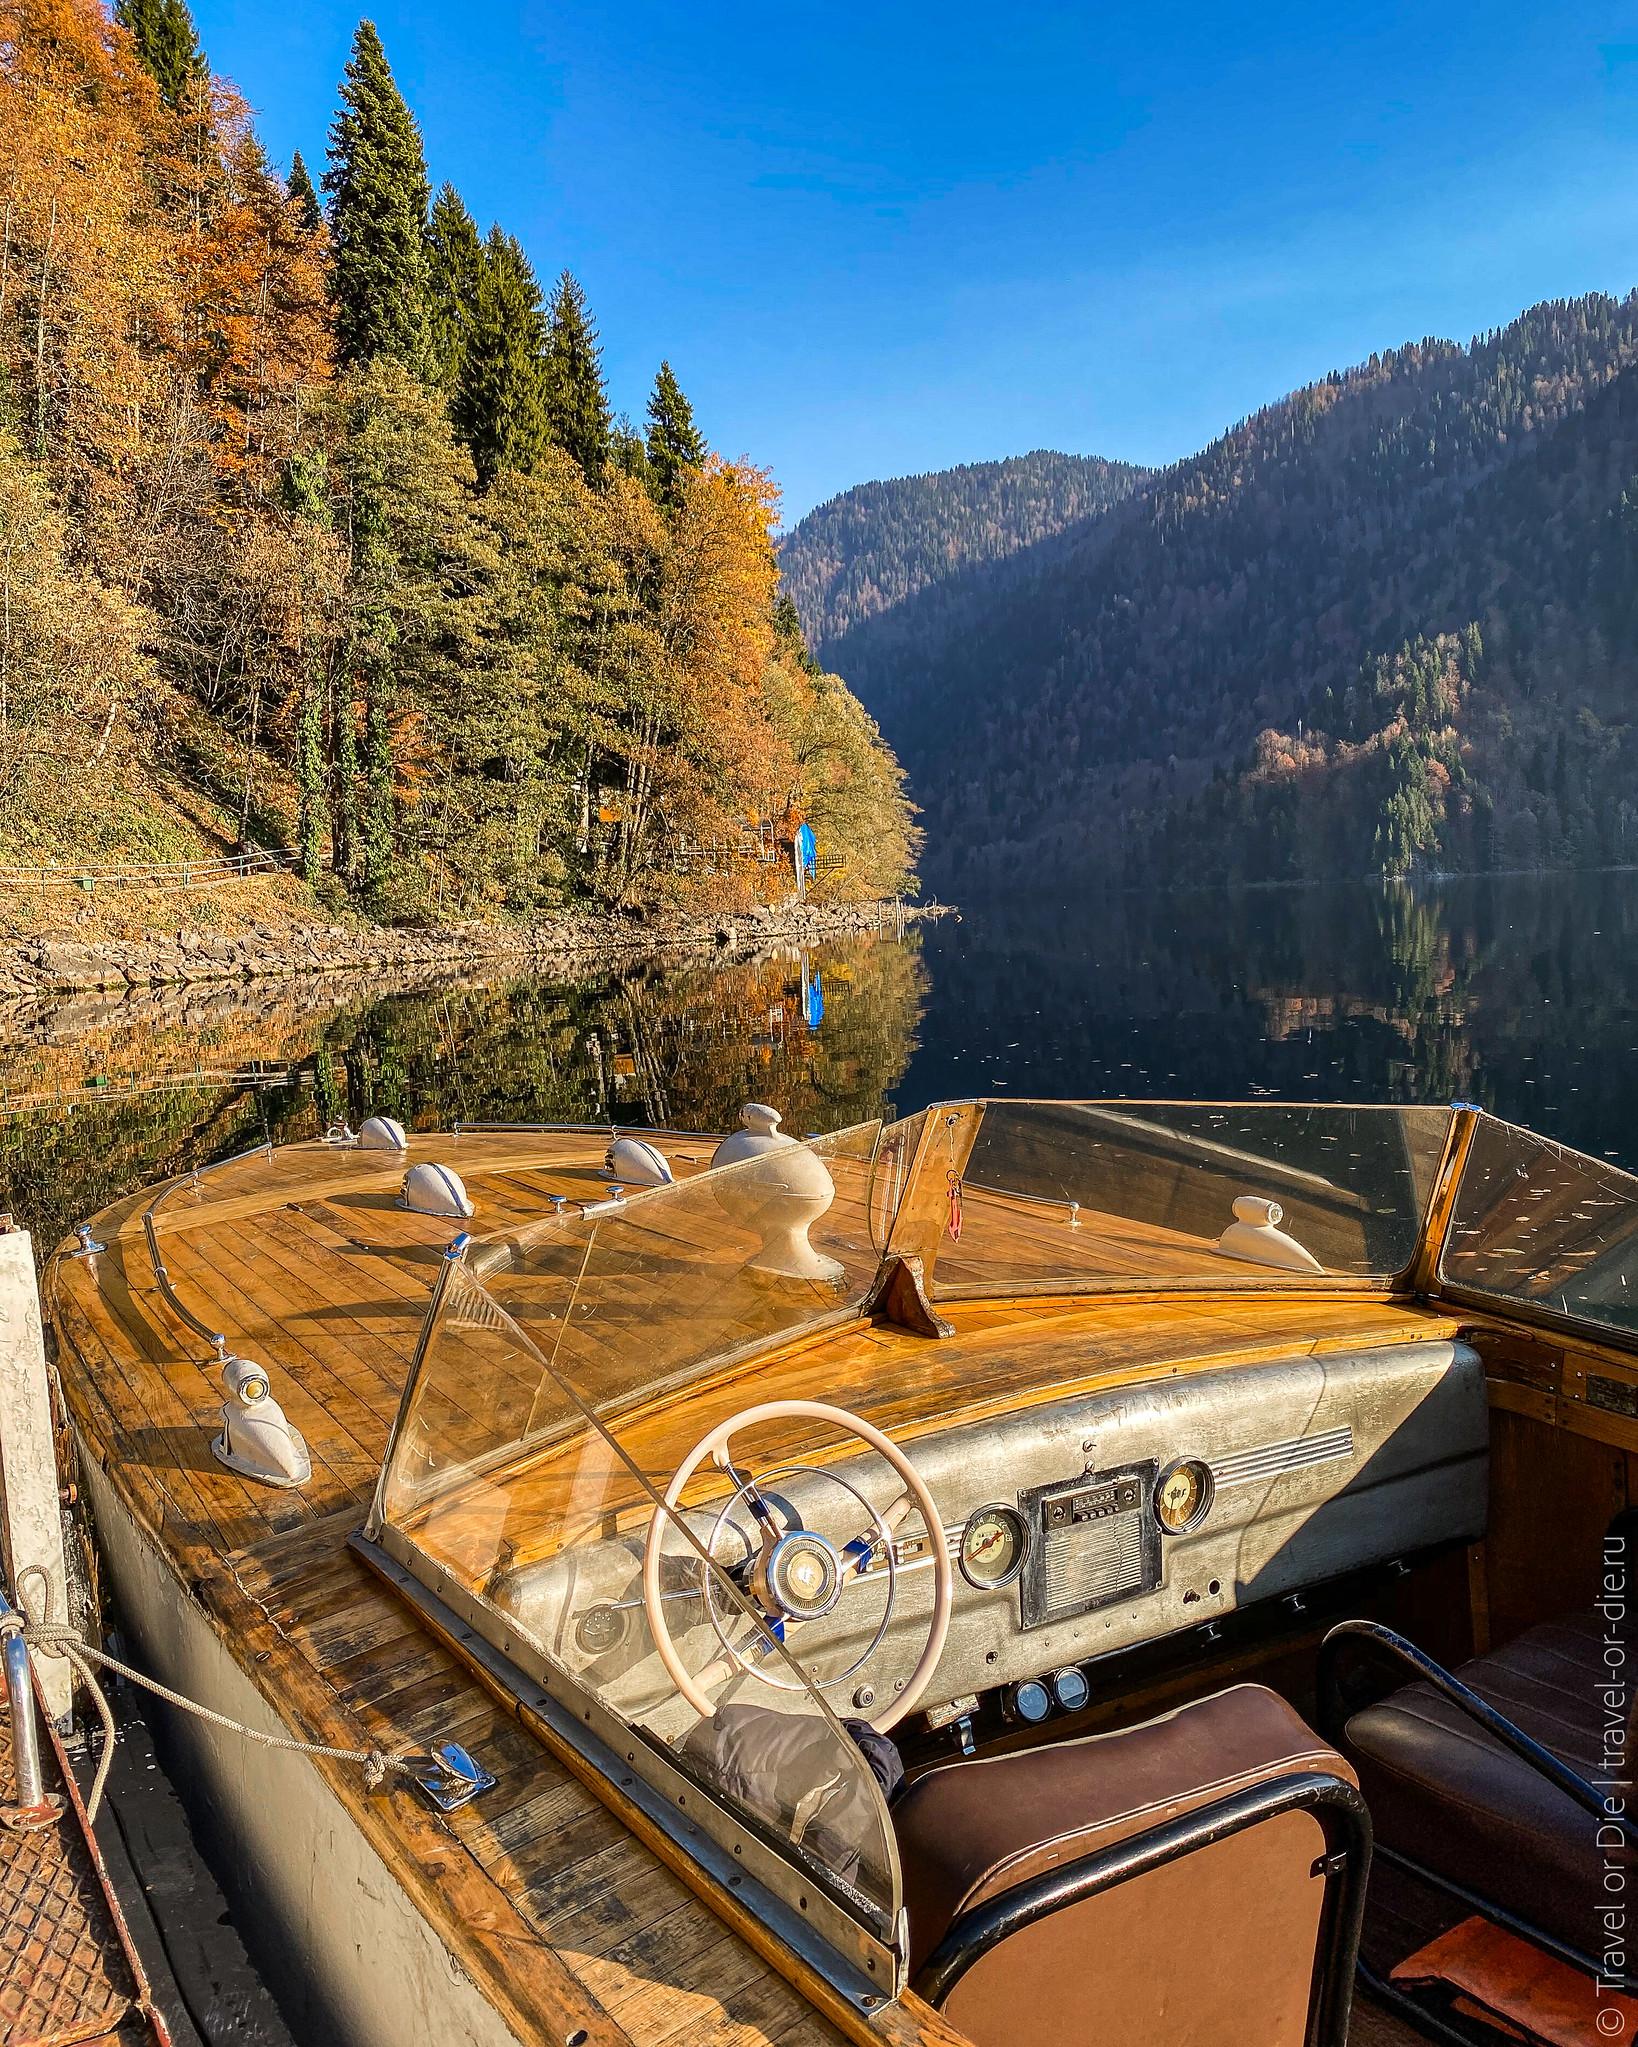 Lake-Ritsa-Abkhazia-iphone-1446